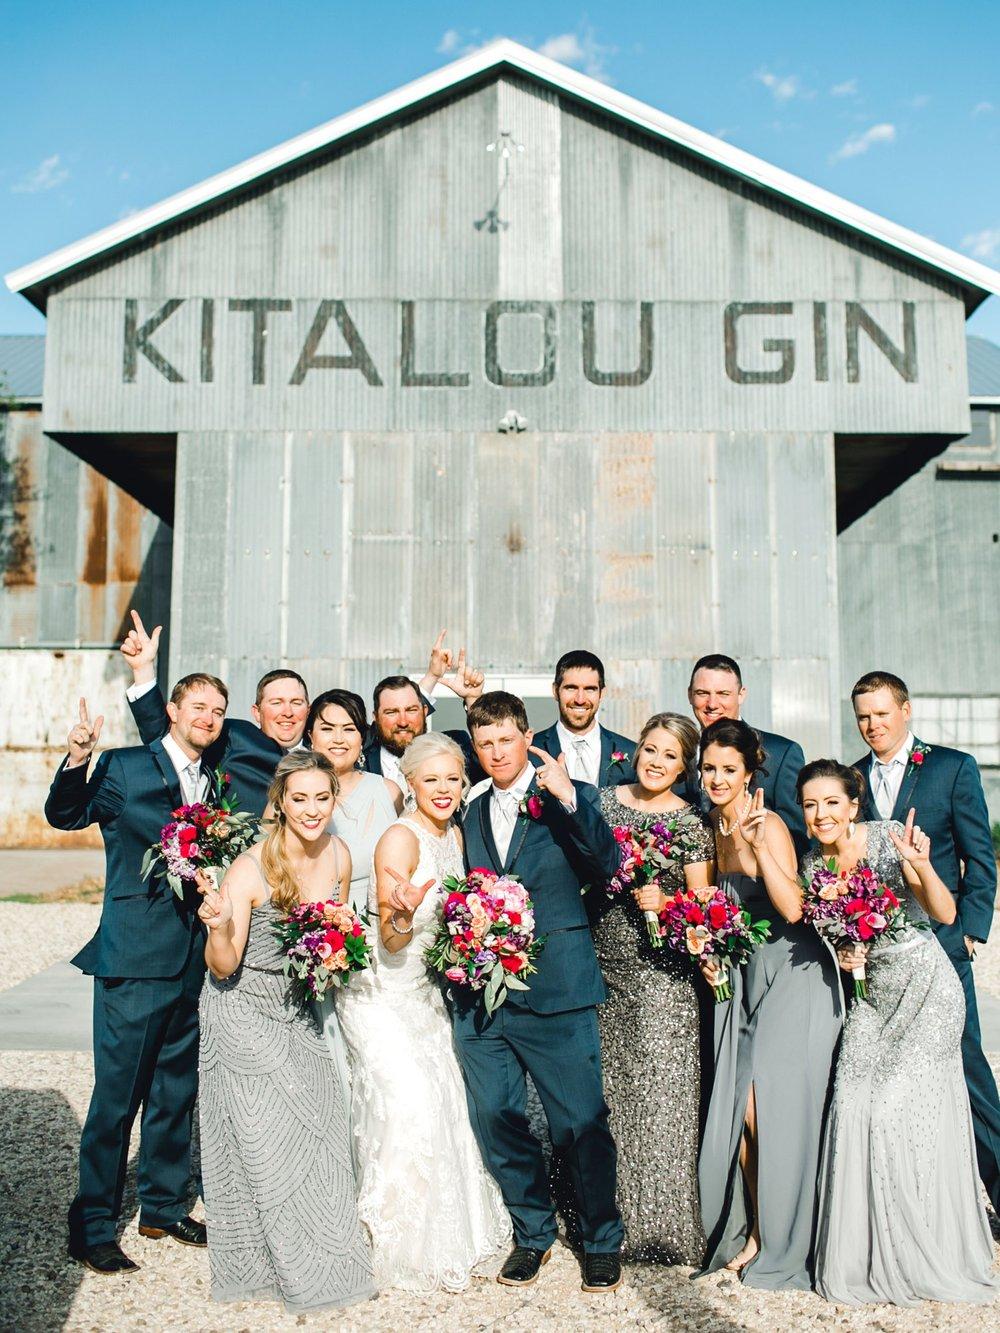 Jenna-and-garrett-Everett-kitalou-gin-lubbock-wedding-dayspring-designs-lubbock-wedding-photographer_0128.jpg